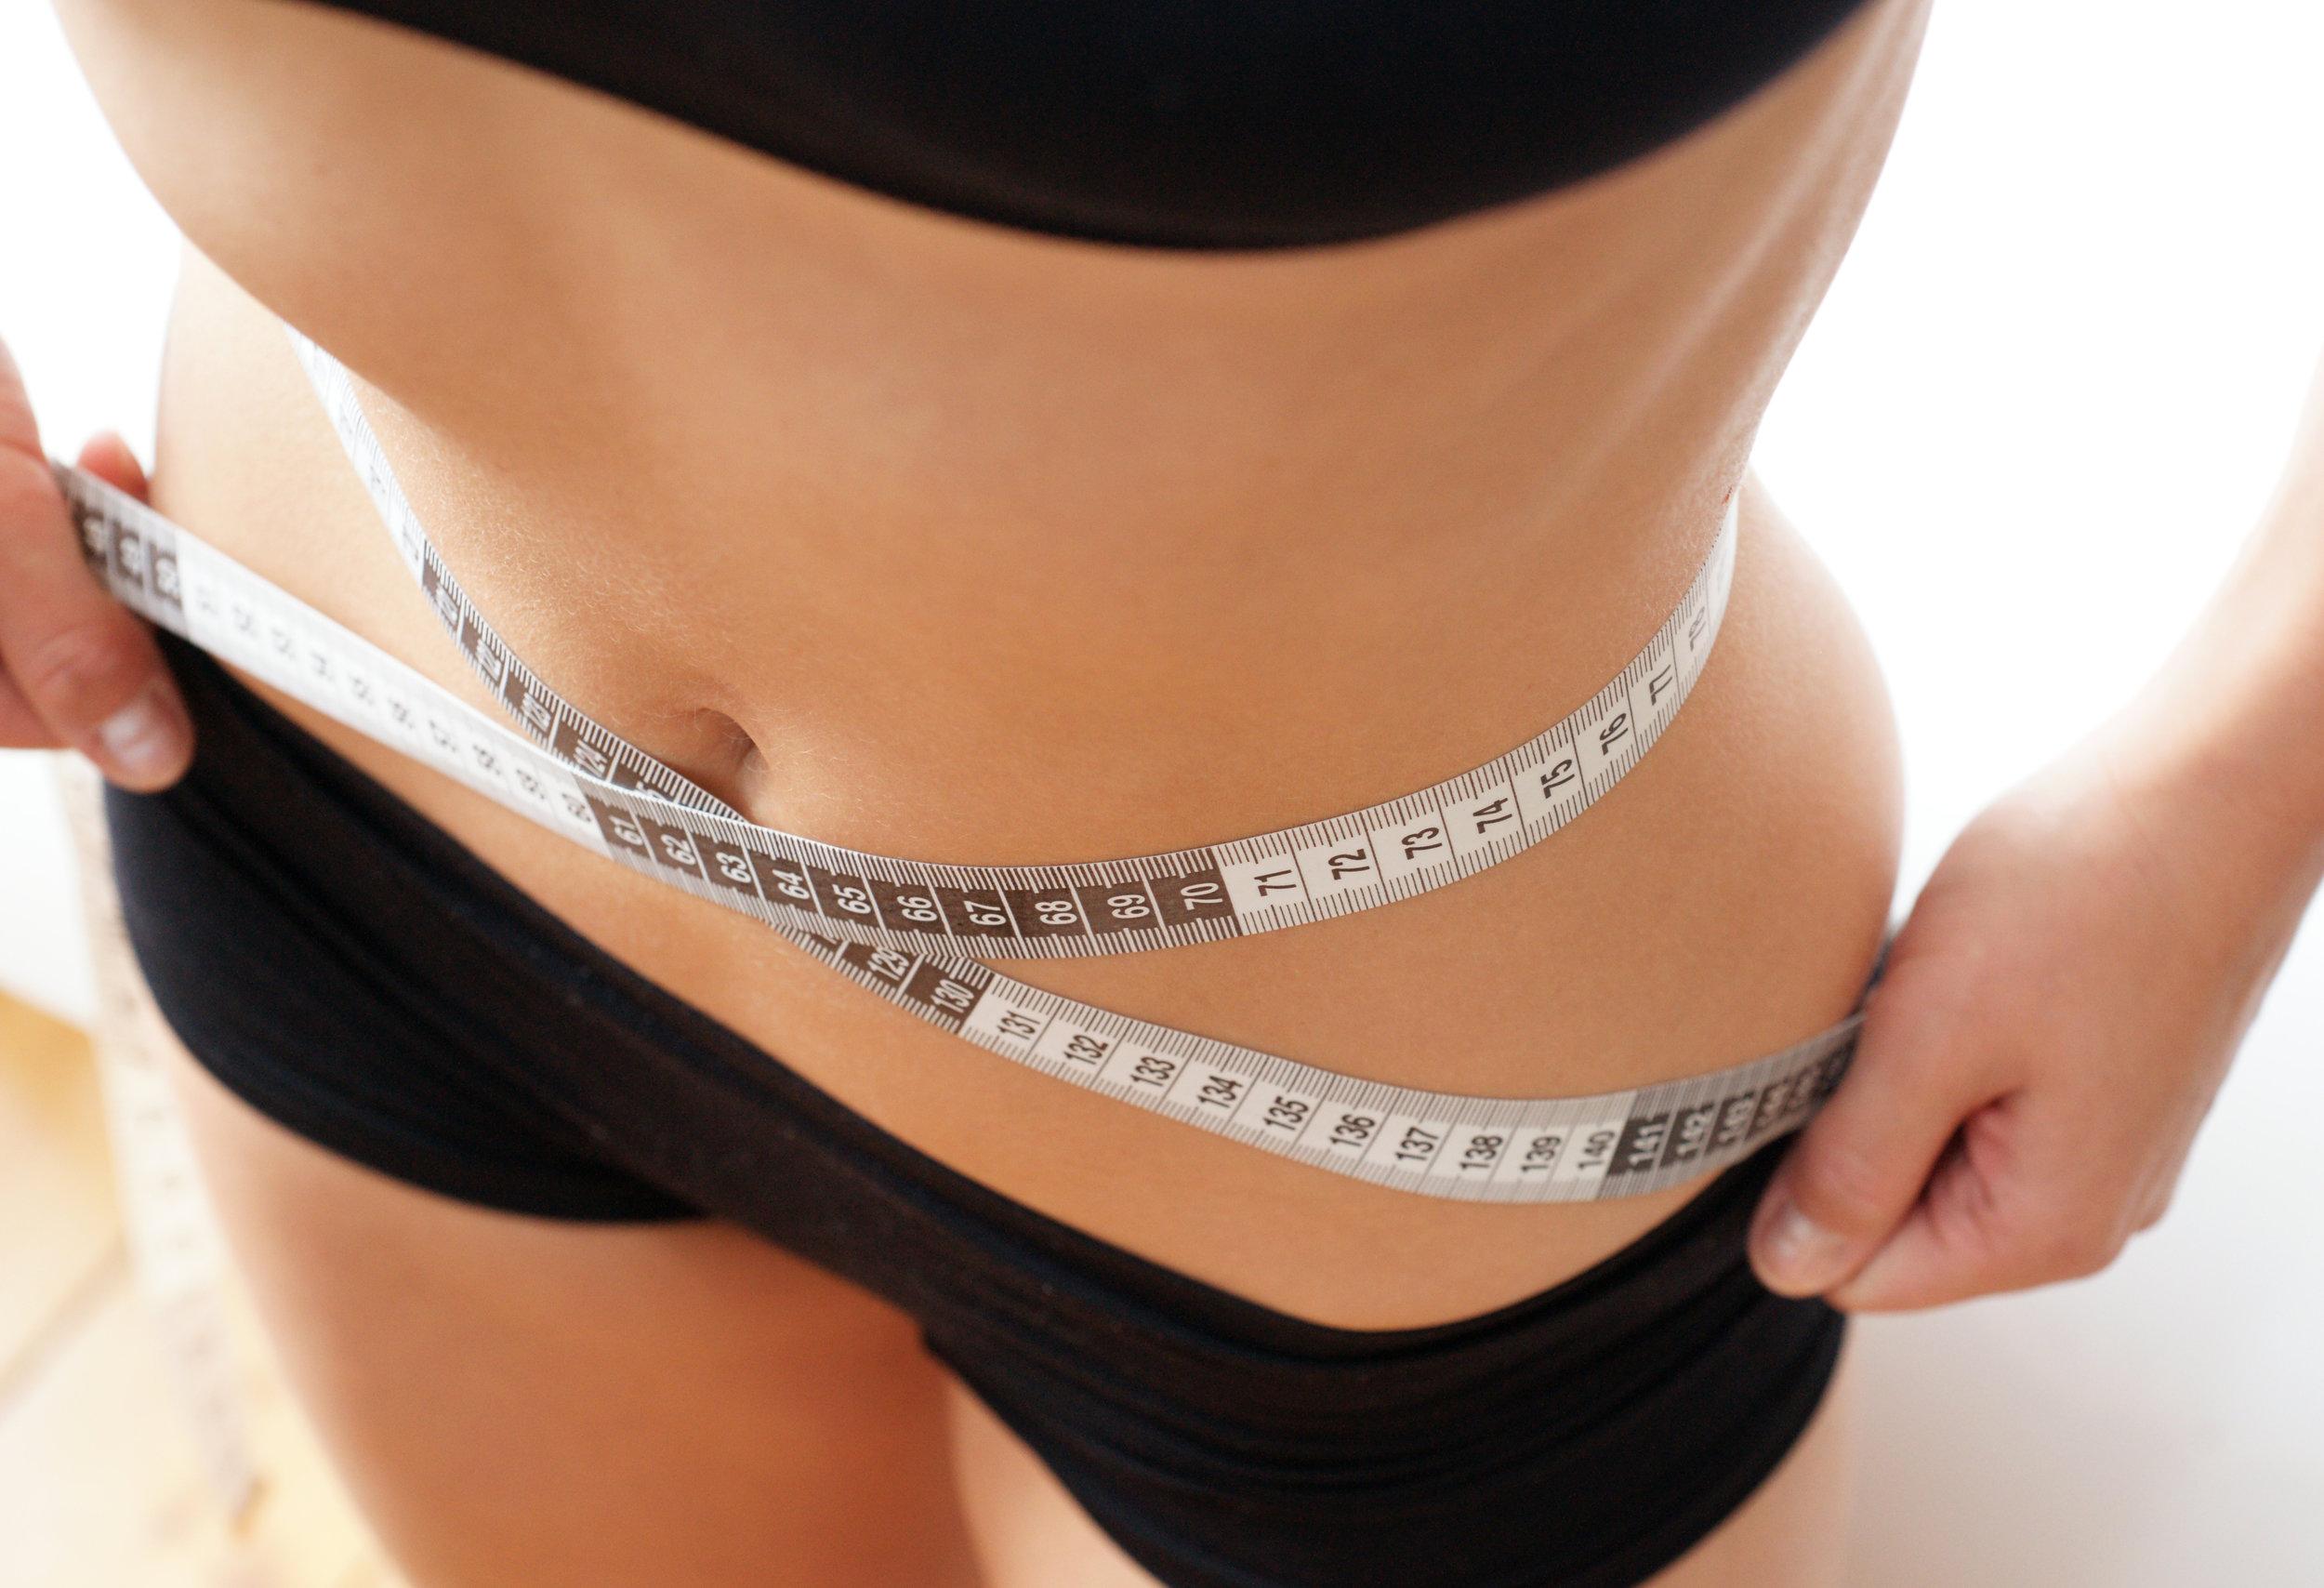 belly-body-calories-diet-42069.jpg